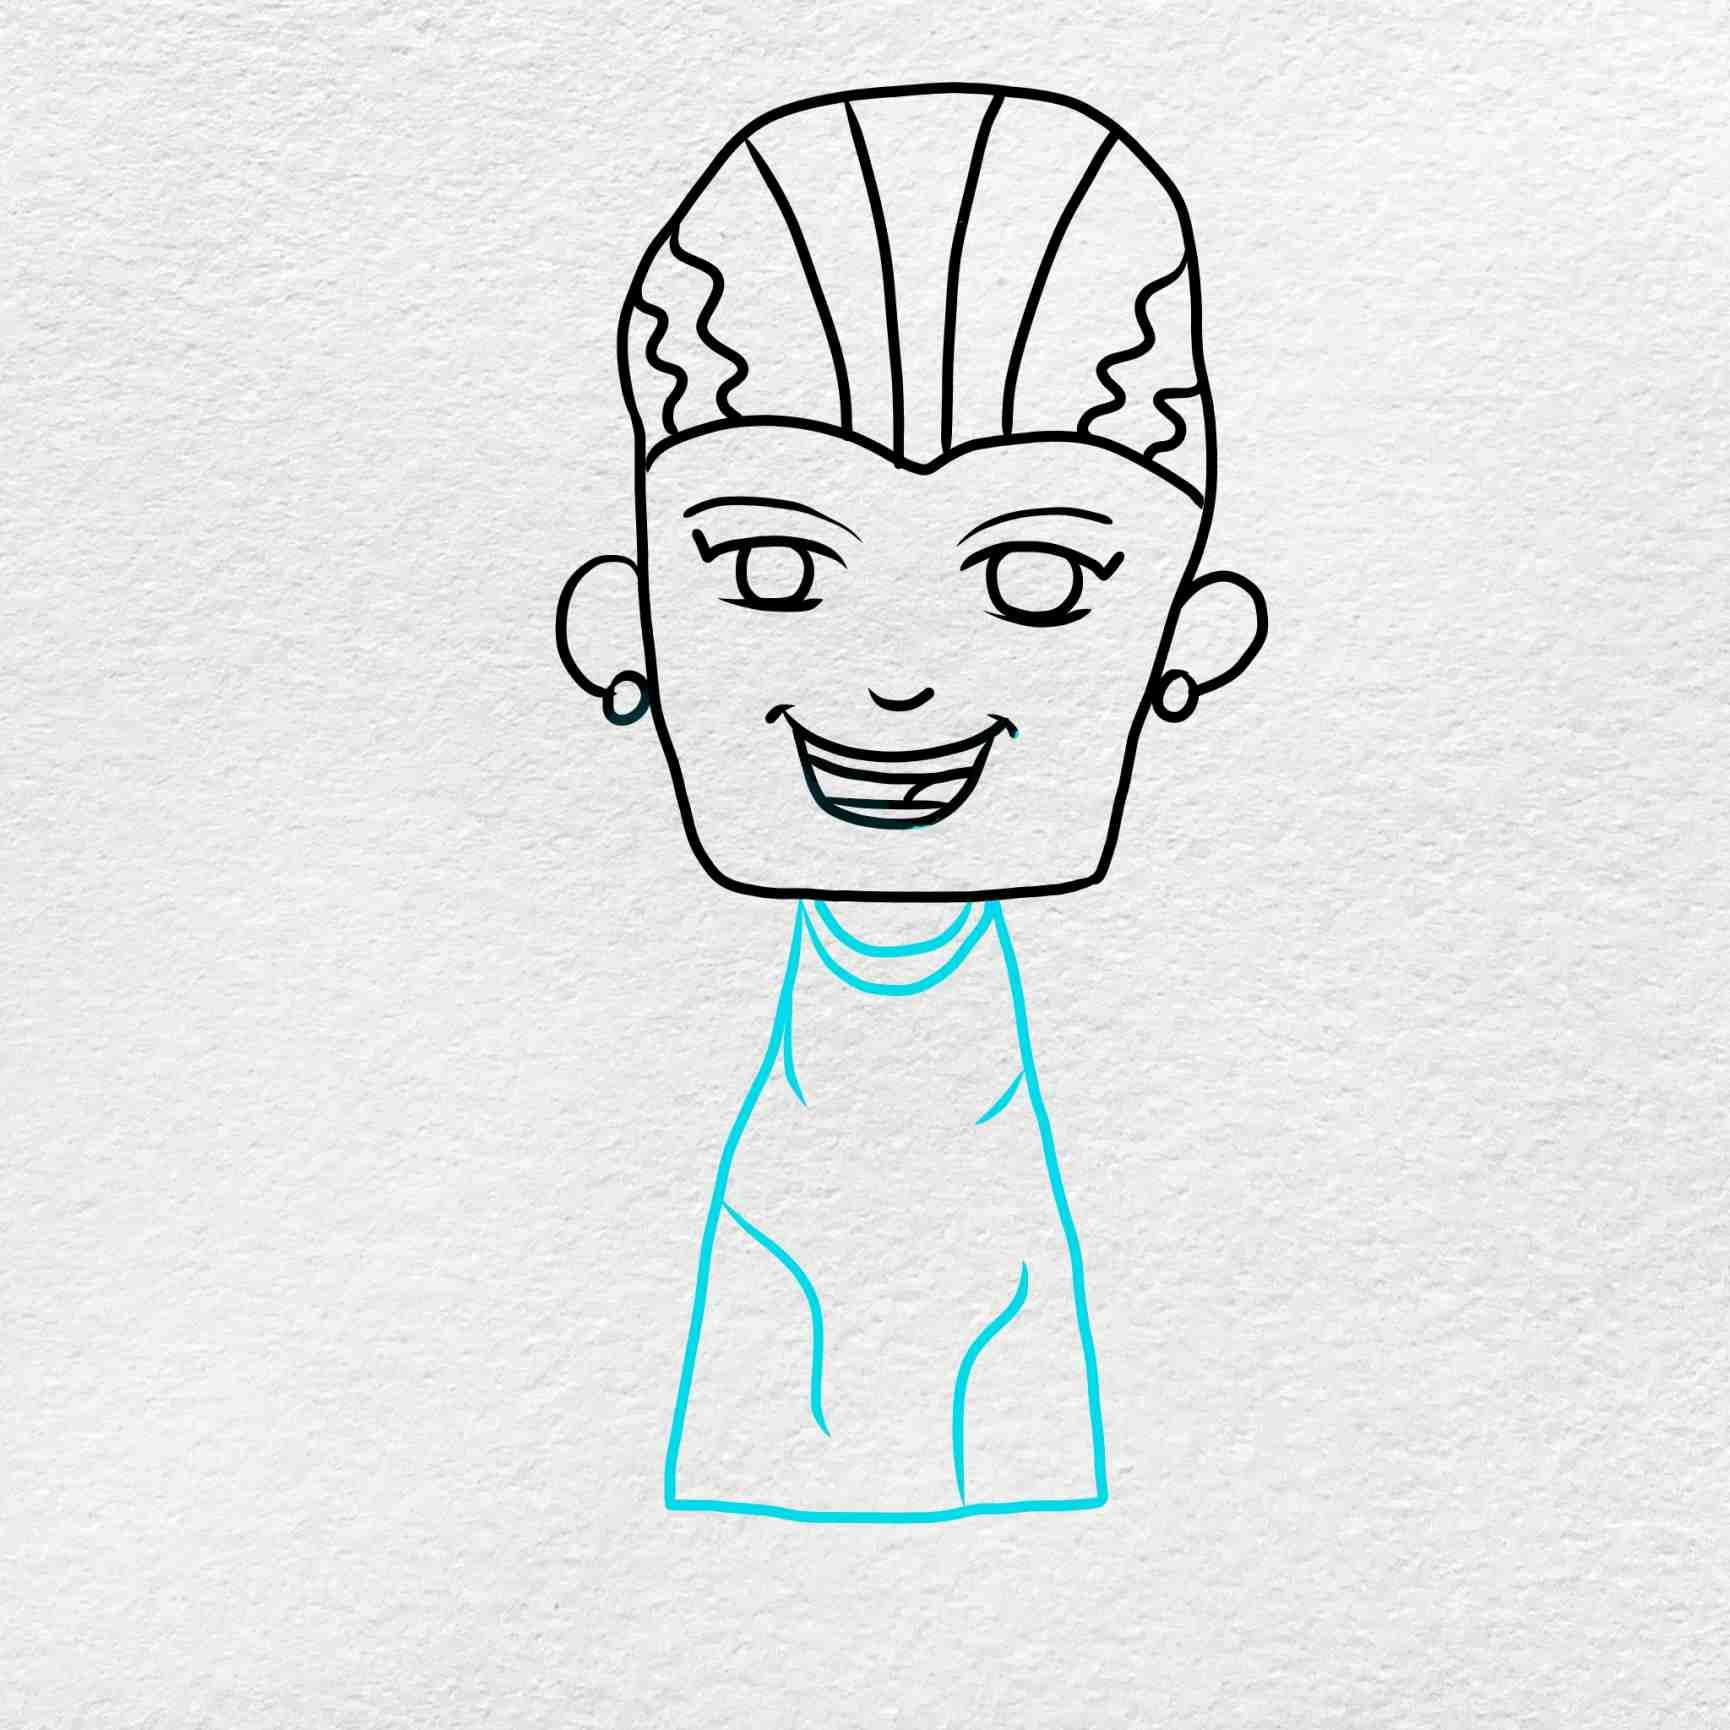 Bride Of Frankenstein Drawing: Step 3